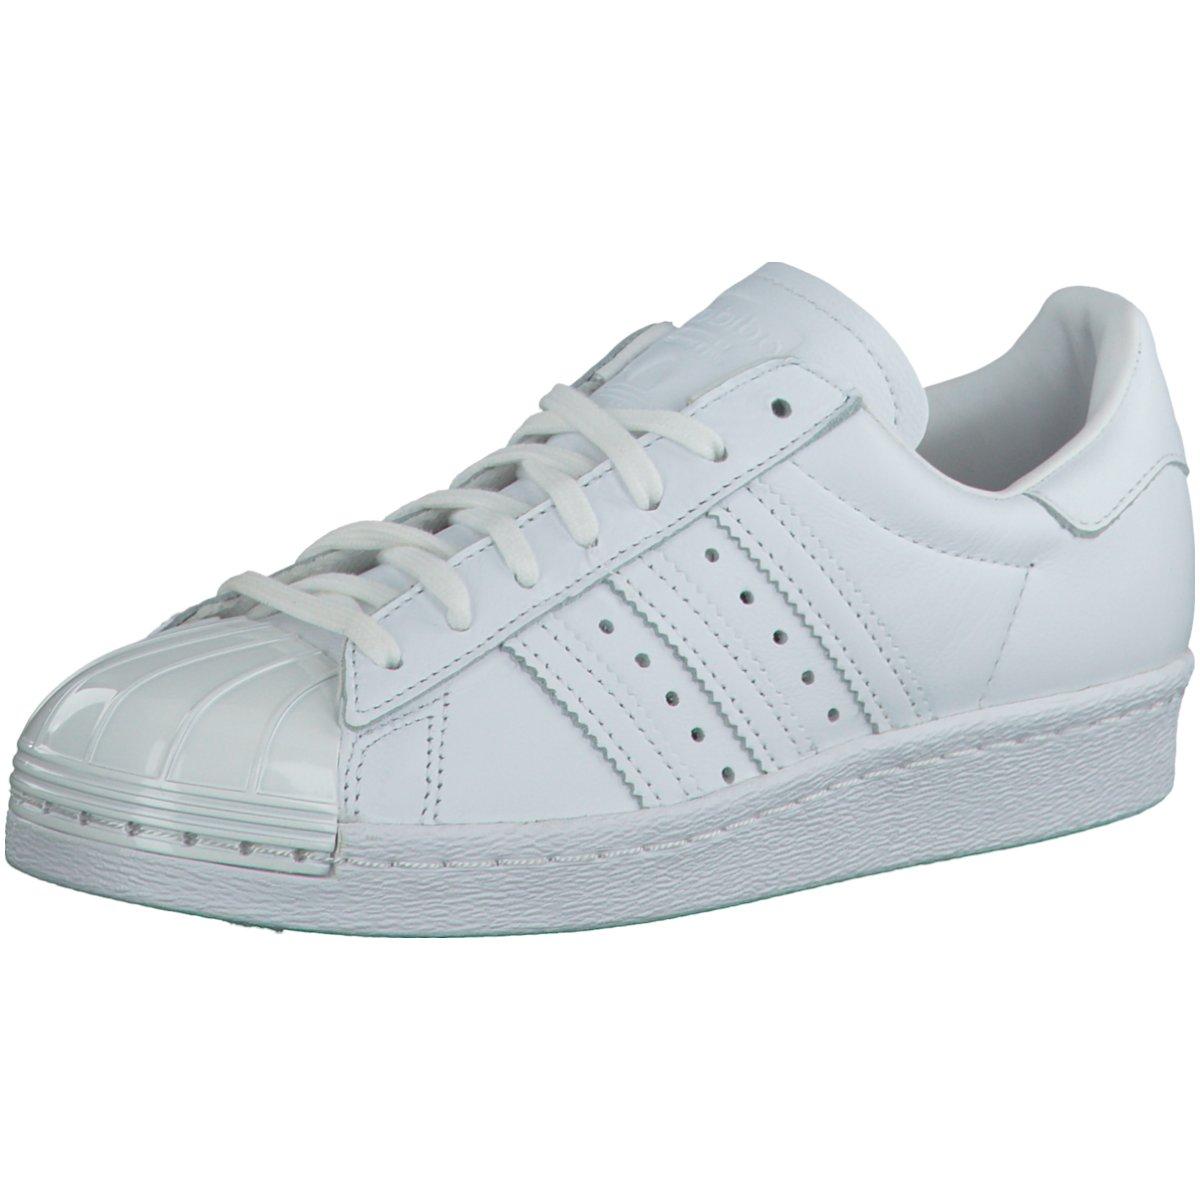 NEU adidas Damen Sneaker Superstar 80S Metal Toe Damen Sneaker weiß S76540